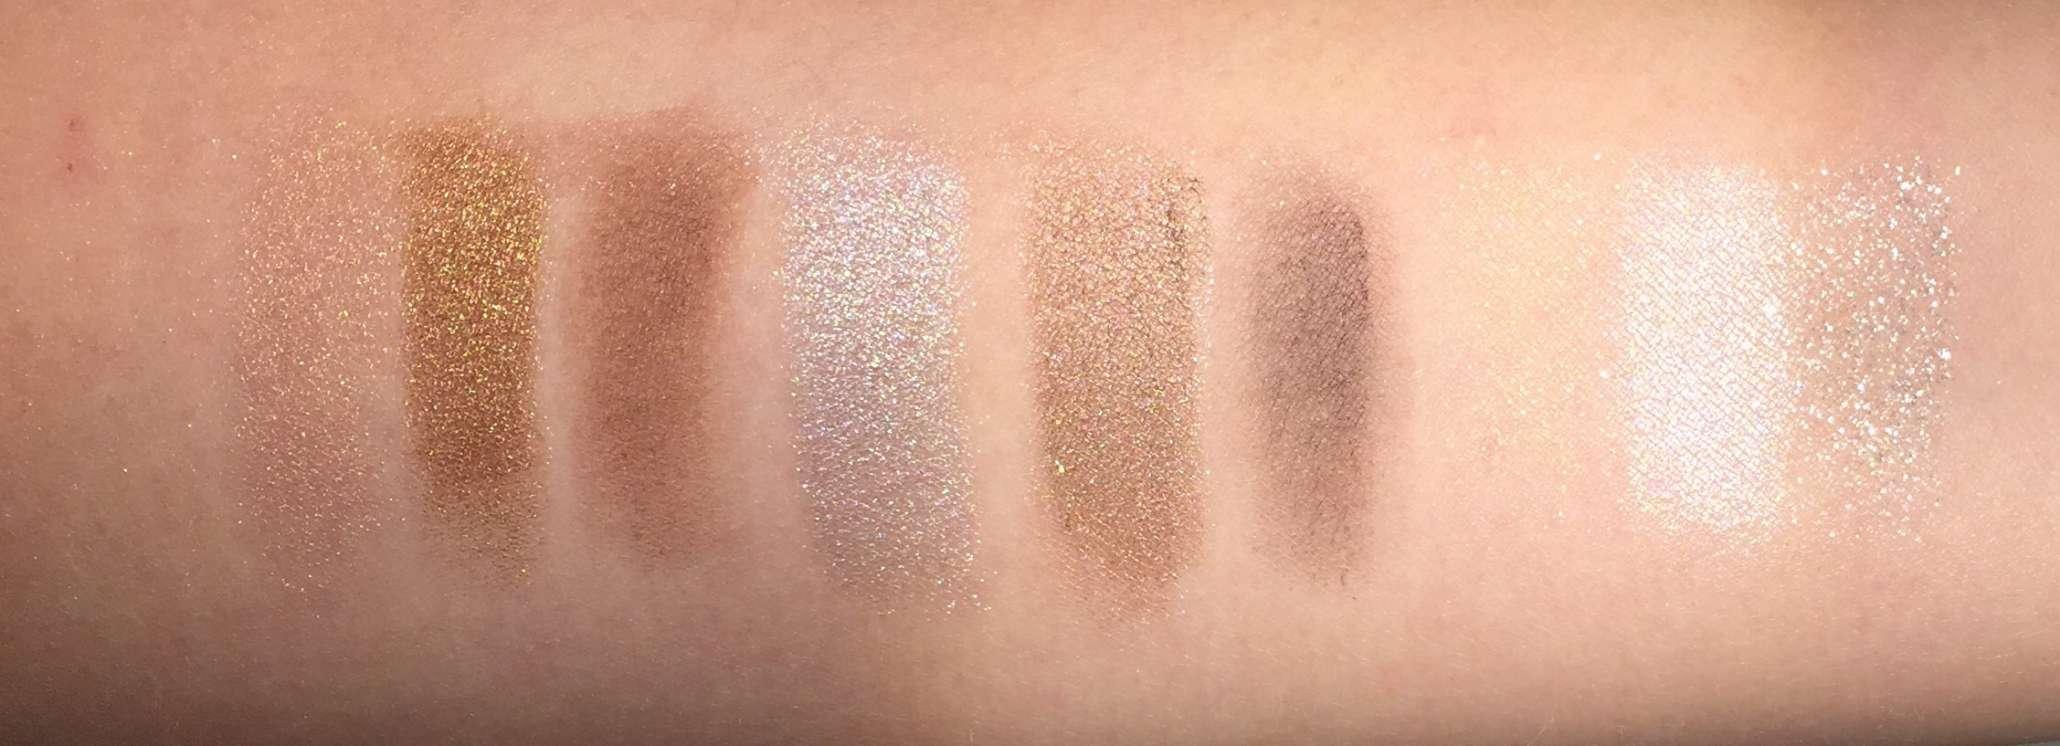 Rituals, Rituals Makeup, Makeup, Krummeskrummelurer, Eyeshadow, Eyeshadow palette, palette